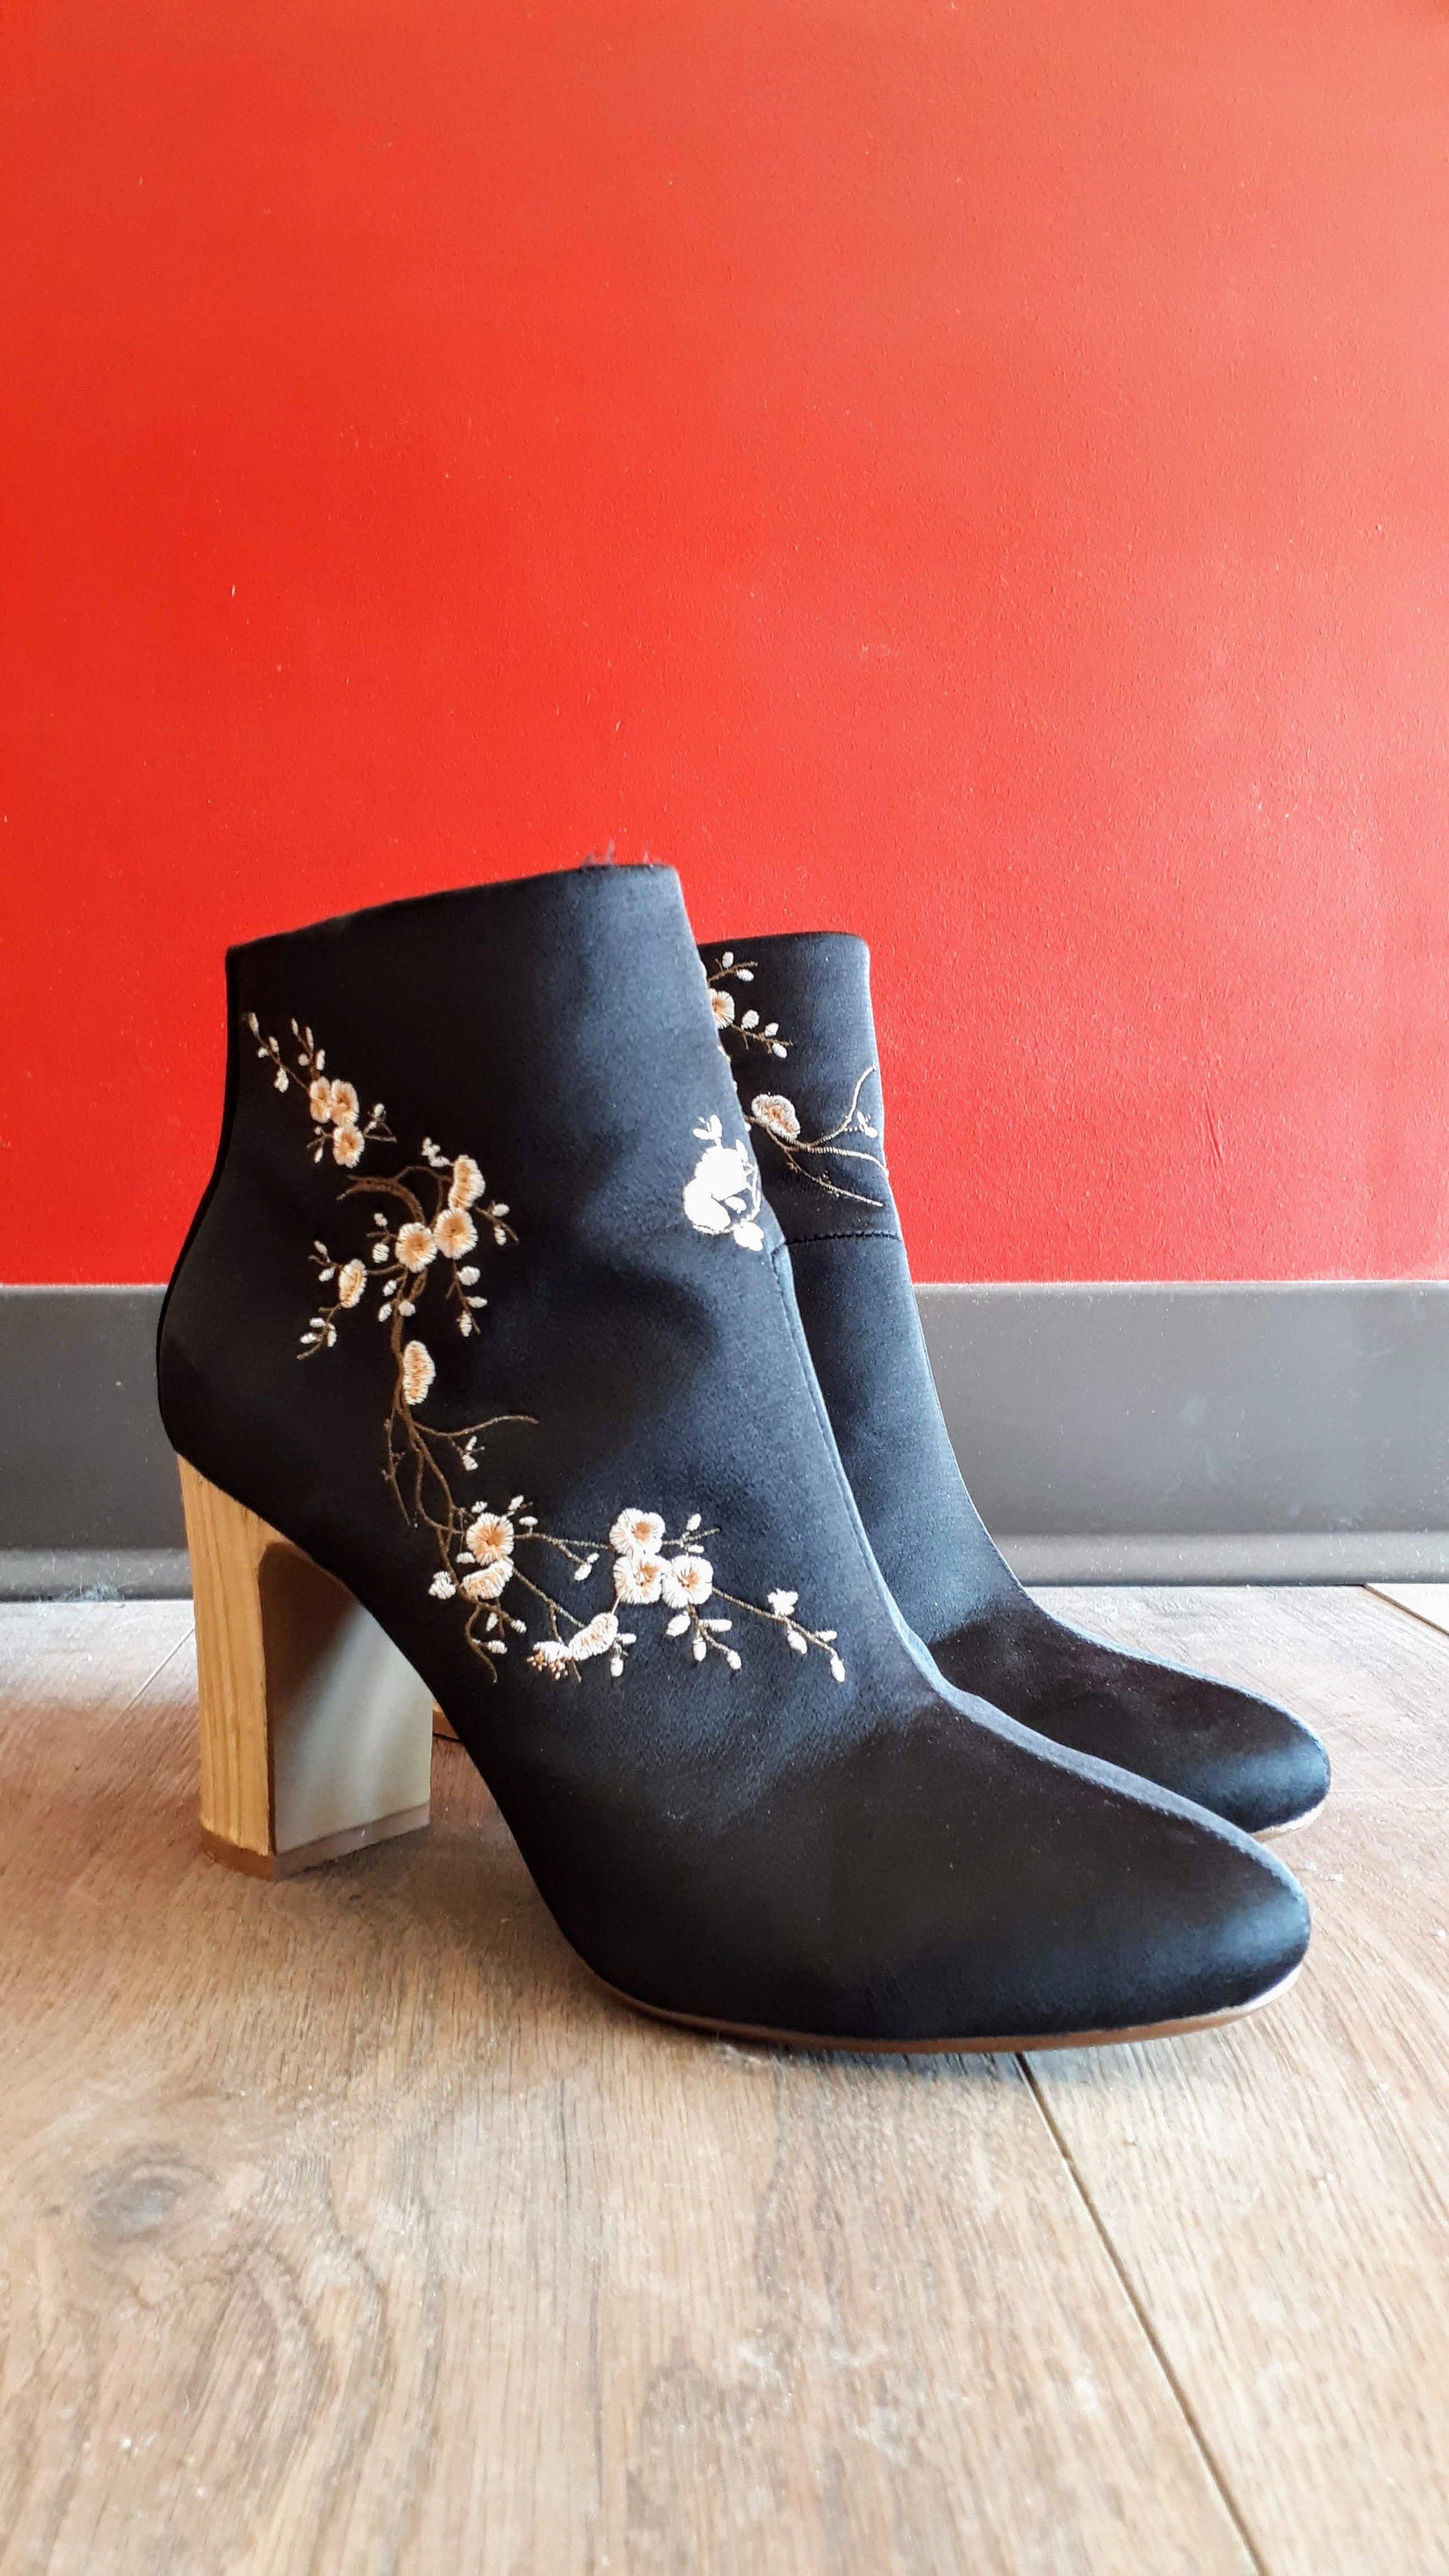 Nanette Lepore boots; Size 9, $56